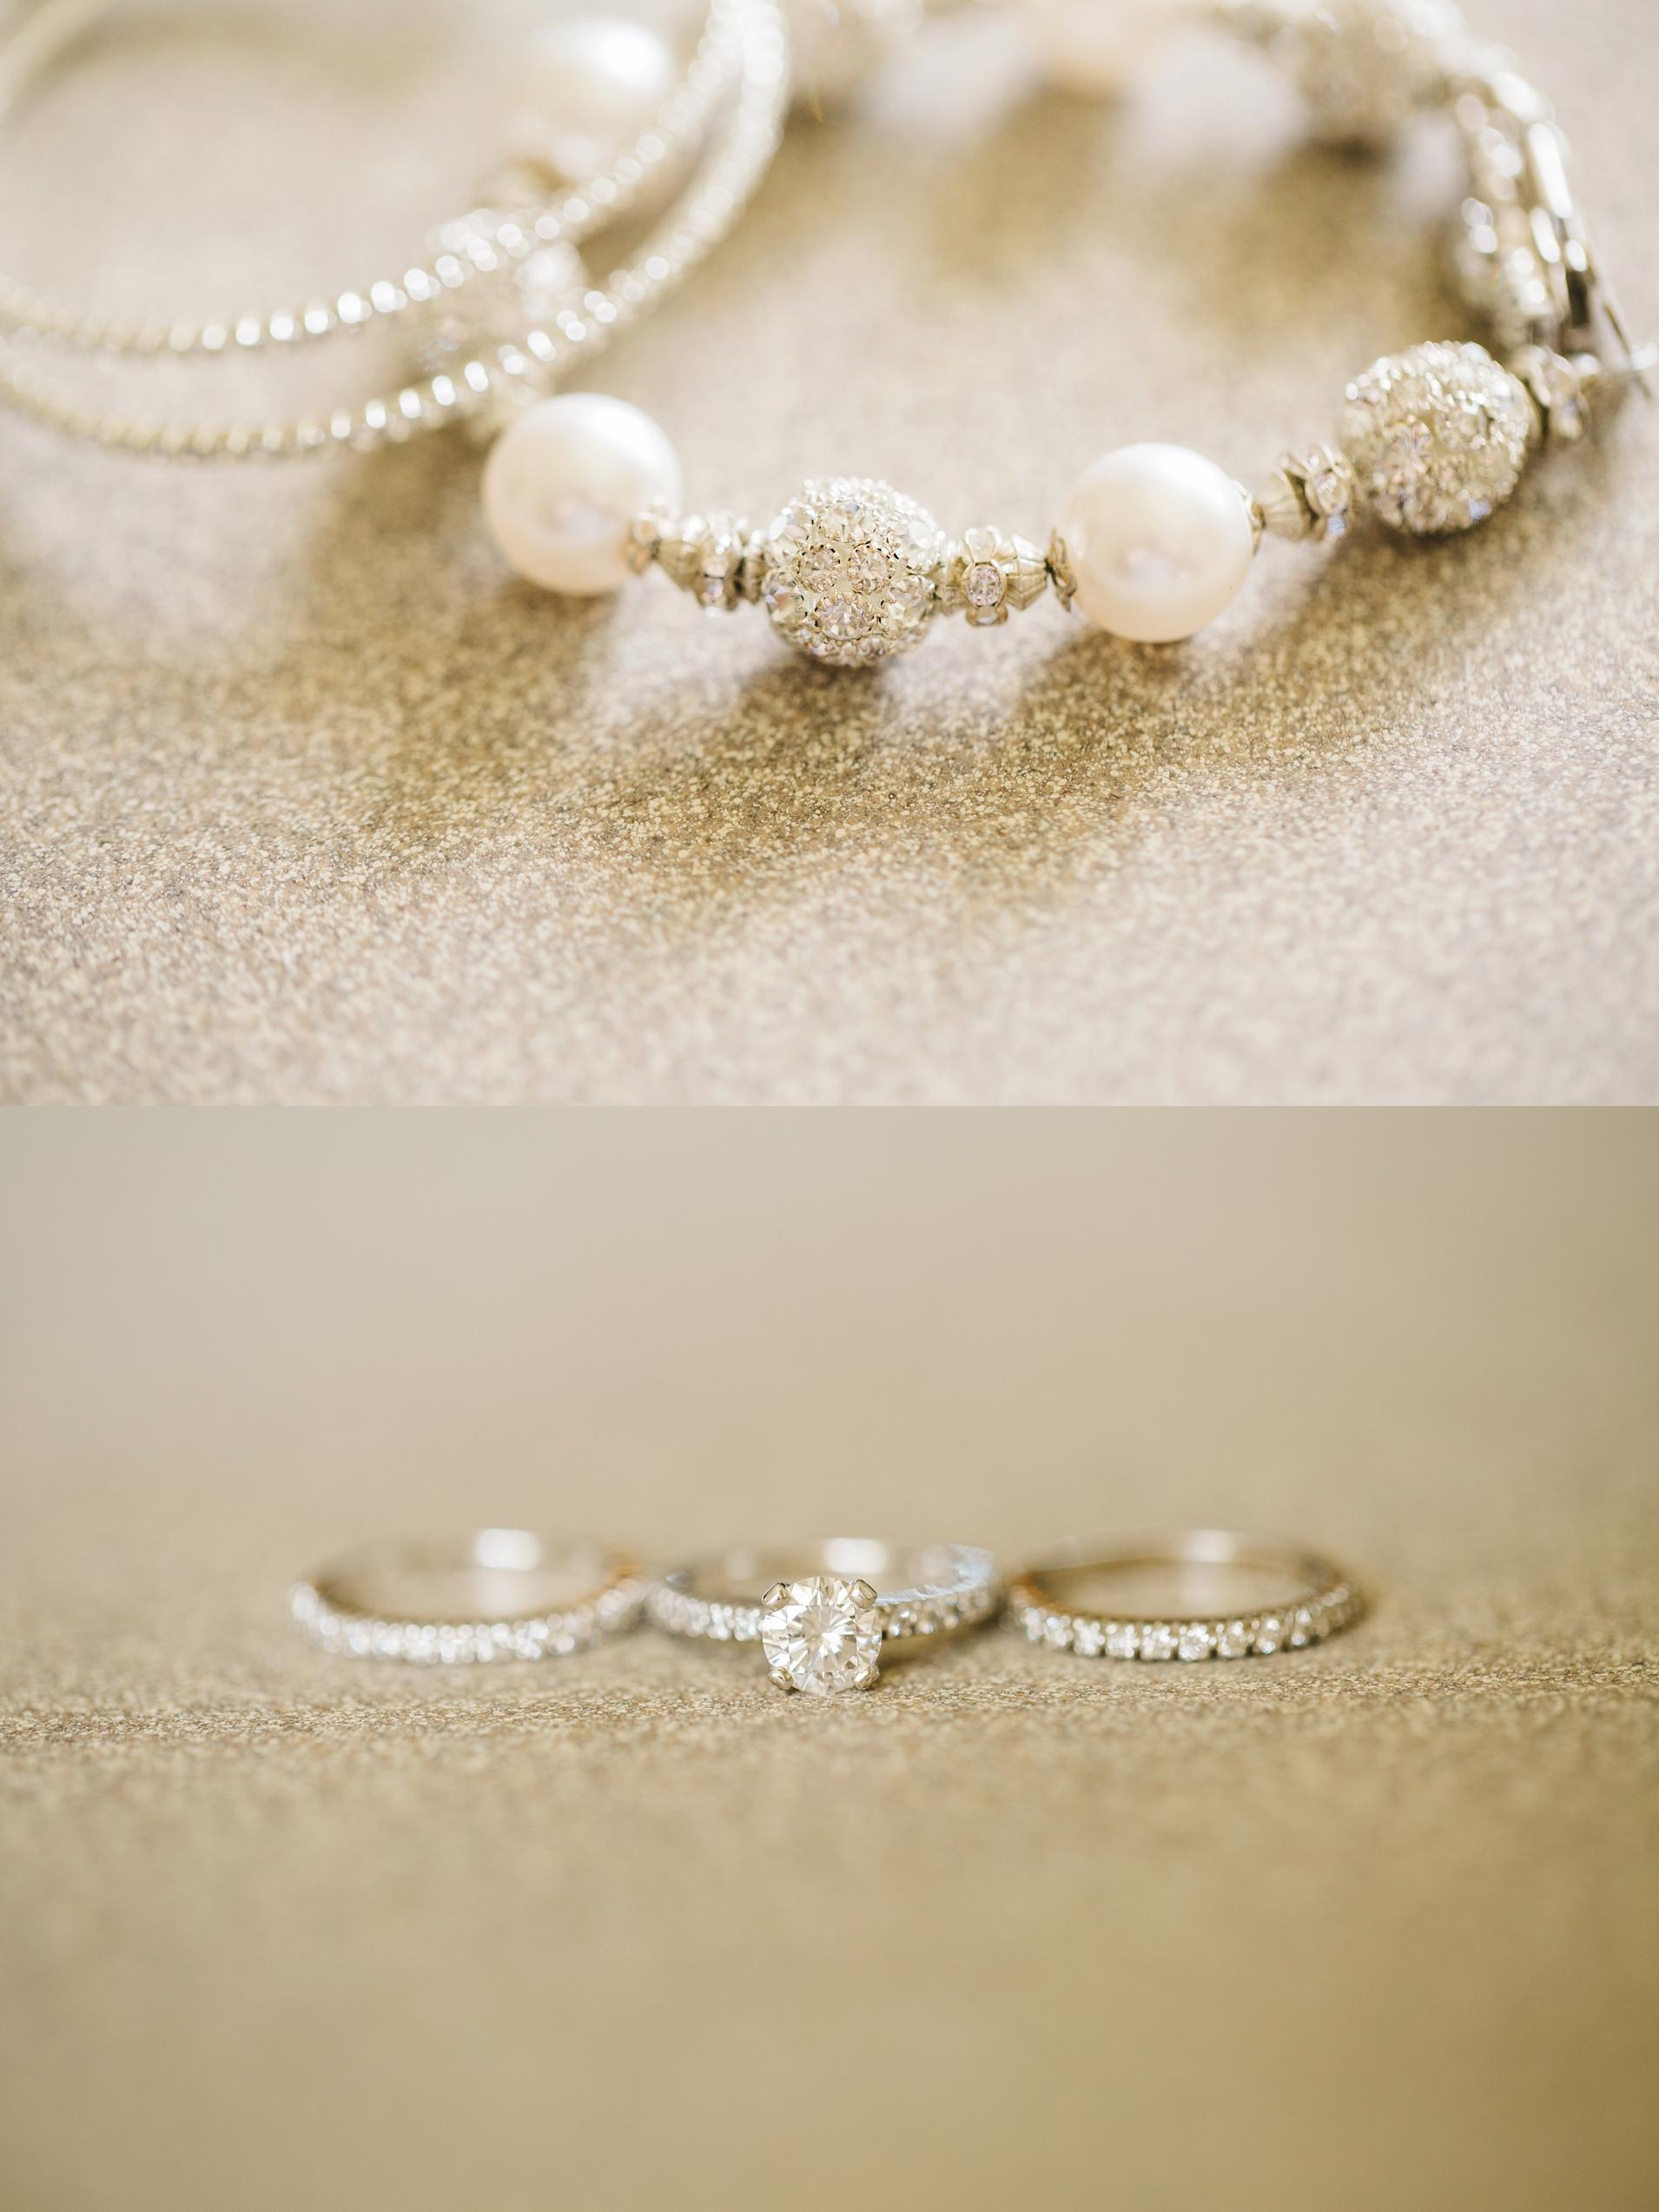 Bridal Details in Orange County, CA - Brittney Hannon Photography